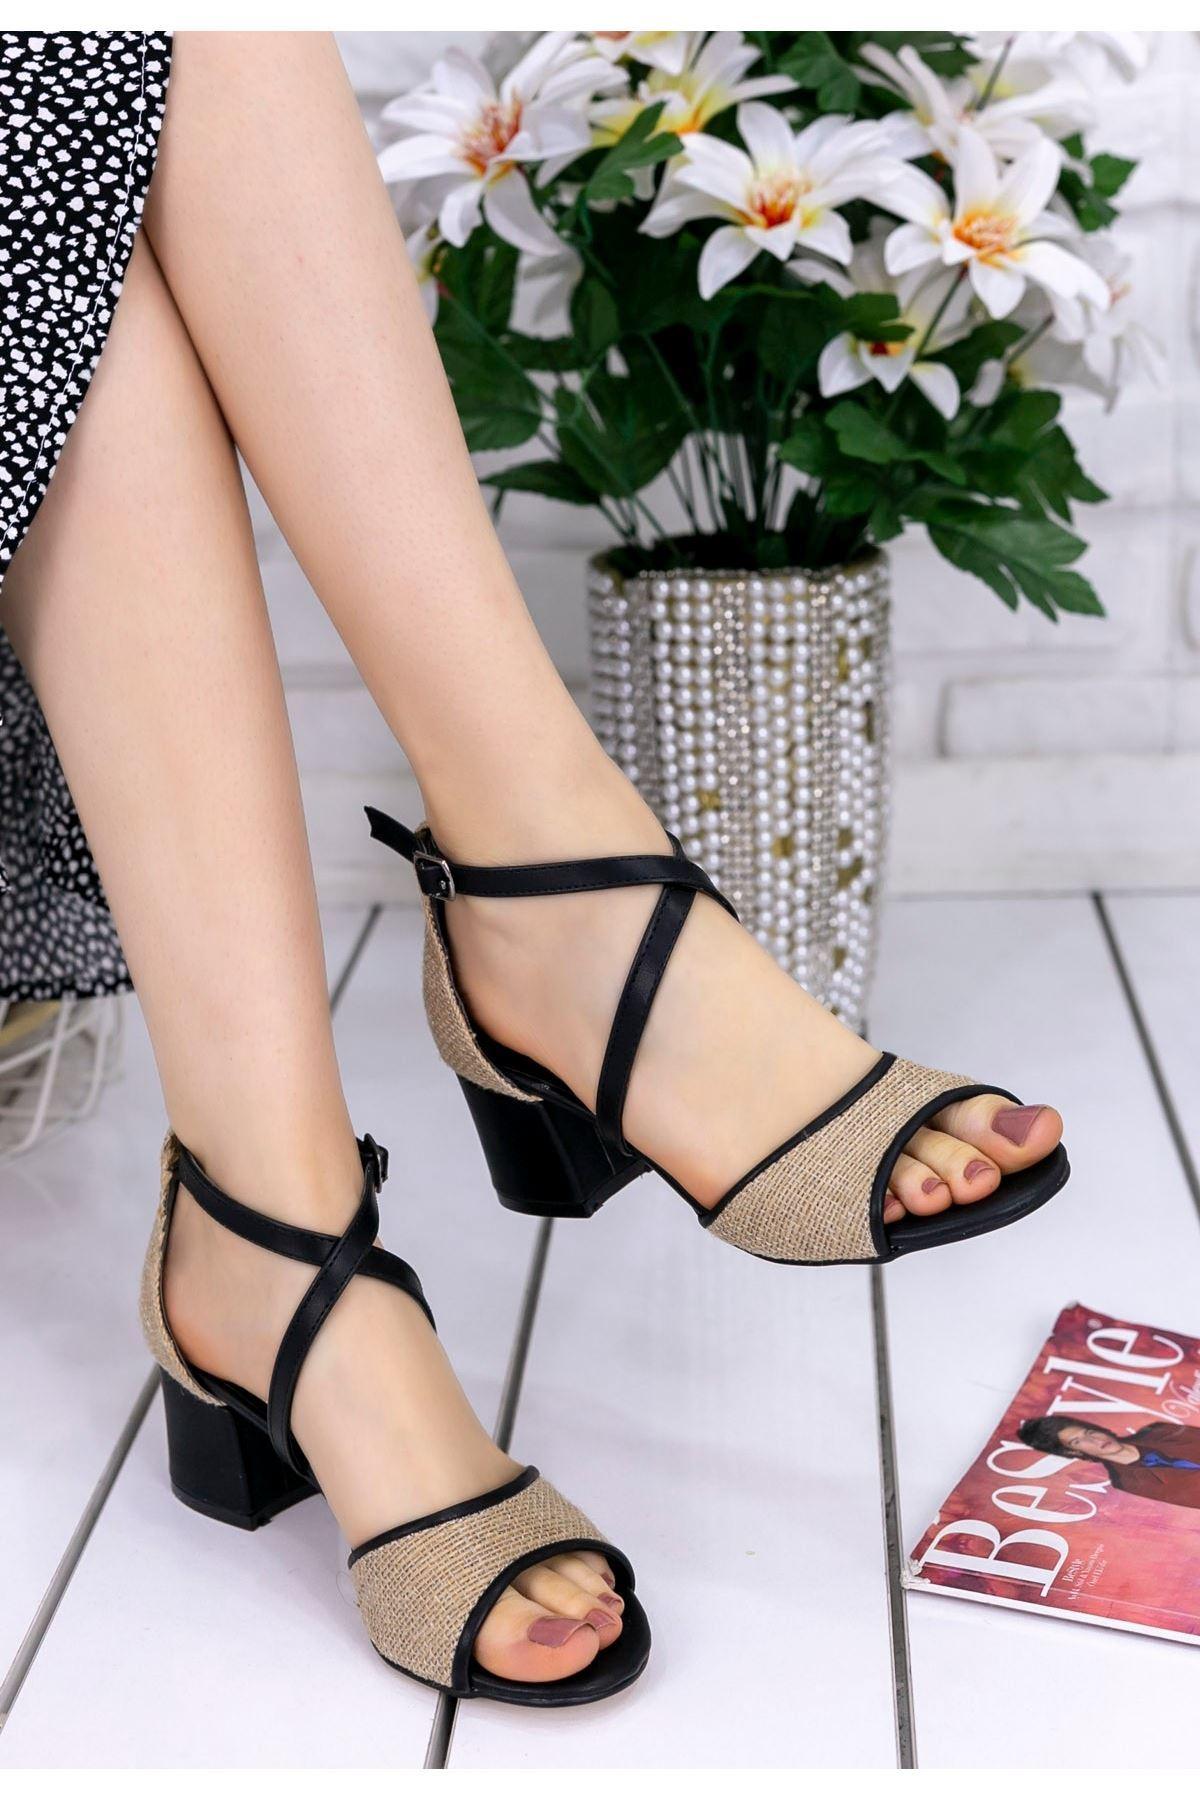 Sherry Siyah Cilt Hasır Detaylı Topuklu Ayakkabı